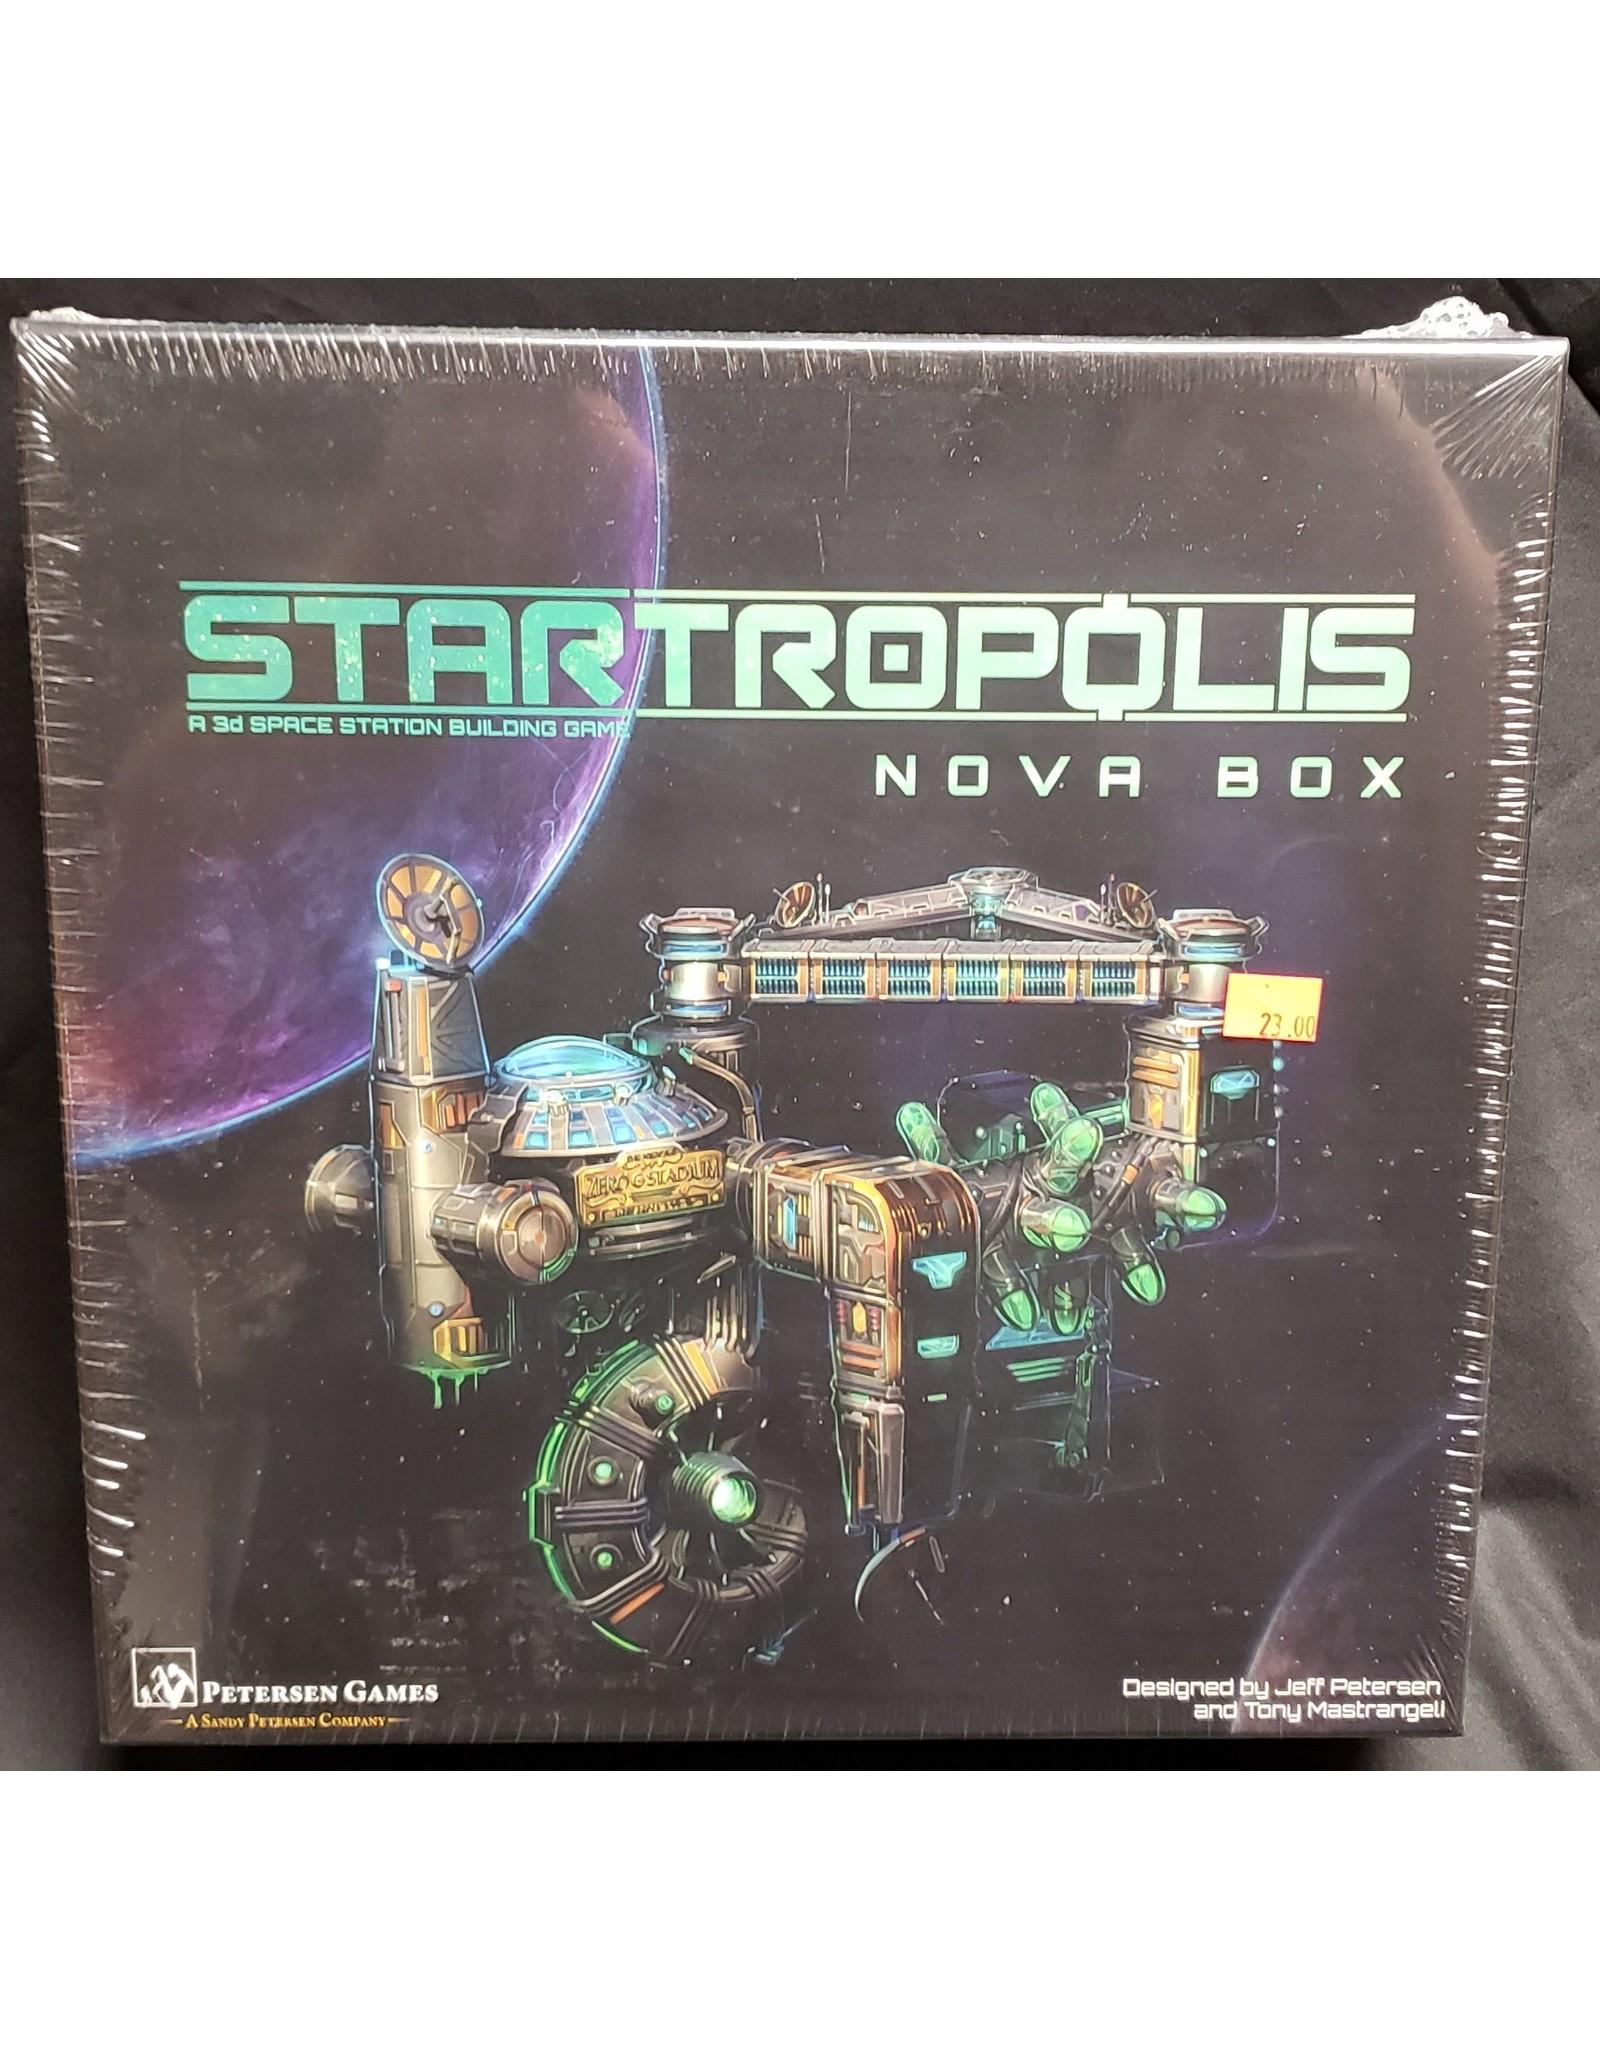 Ding & Dent Startropolis Nova Box (Ding & Dent)